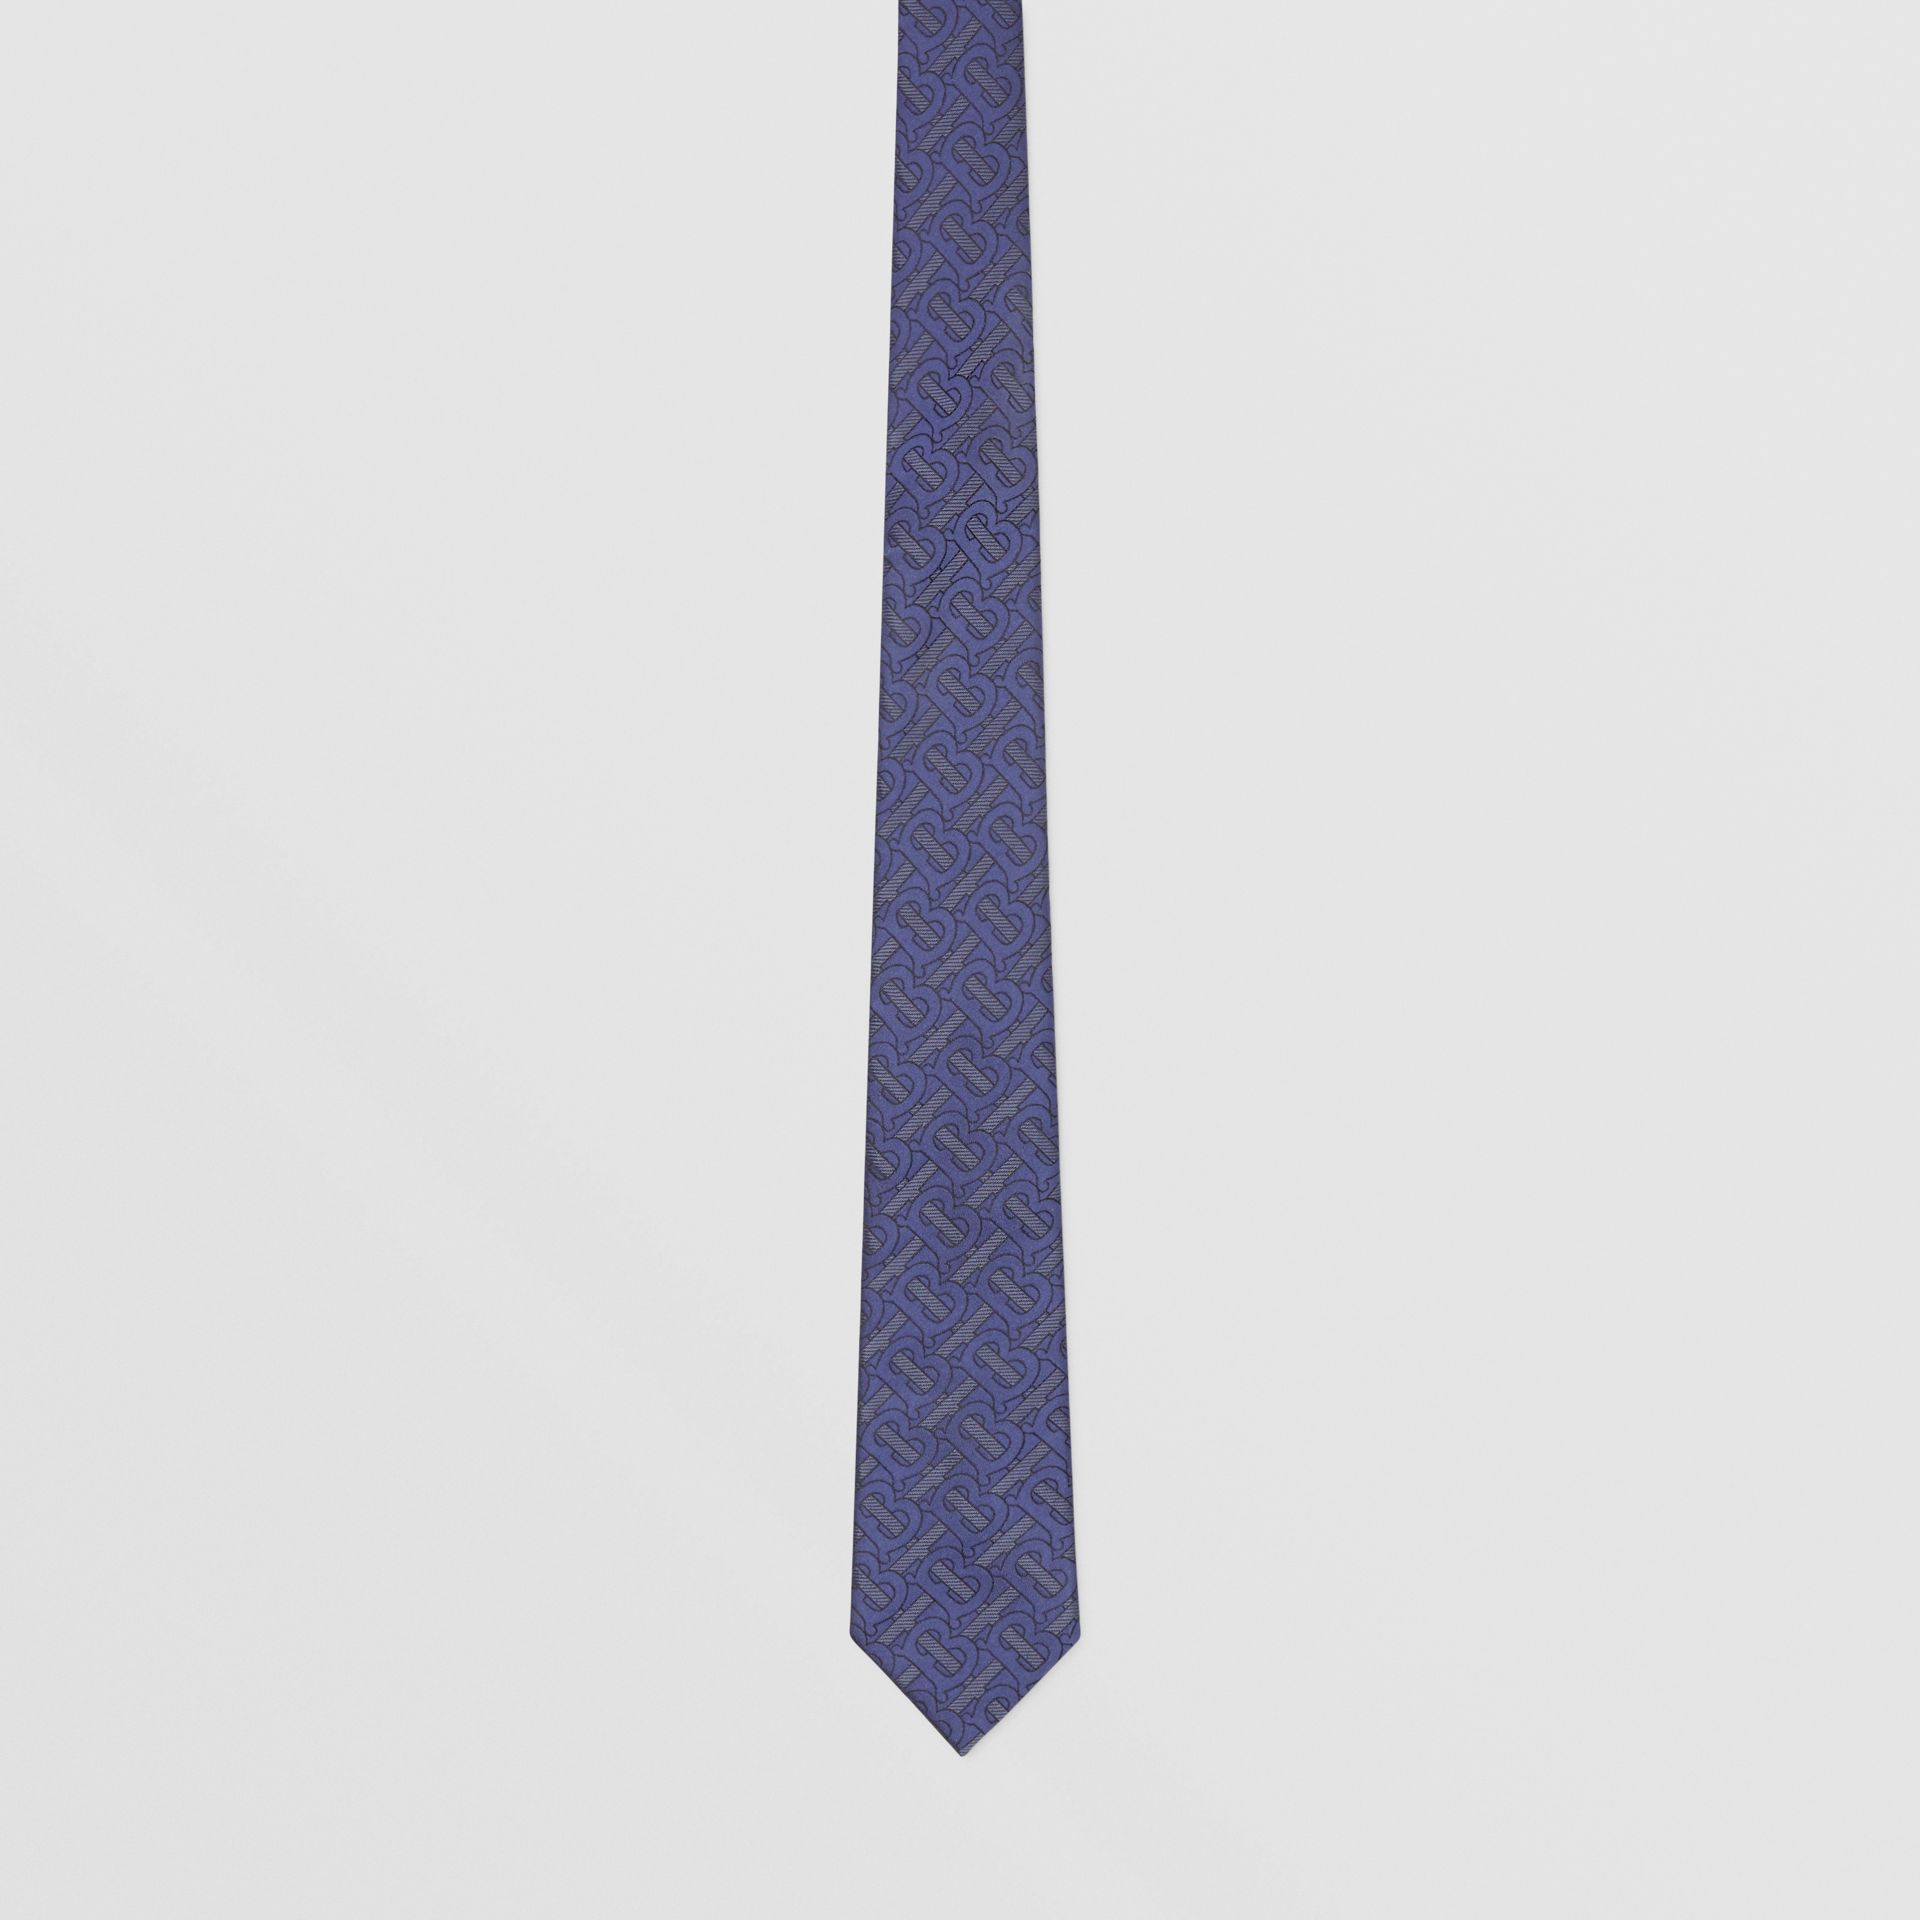 Classic Cut Monogram Silk Blend Jacquard Tie in Bright Indigo - Men | Burberry Hong Kong S.A.R - gallery image 3